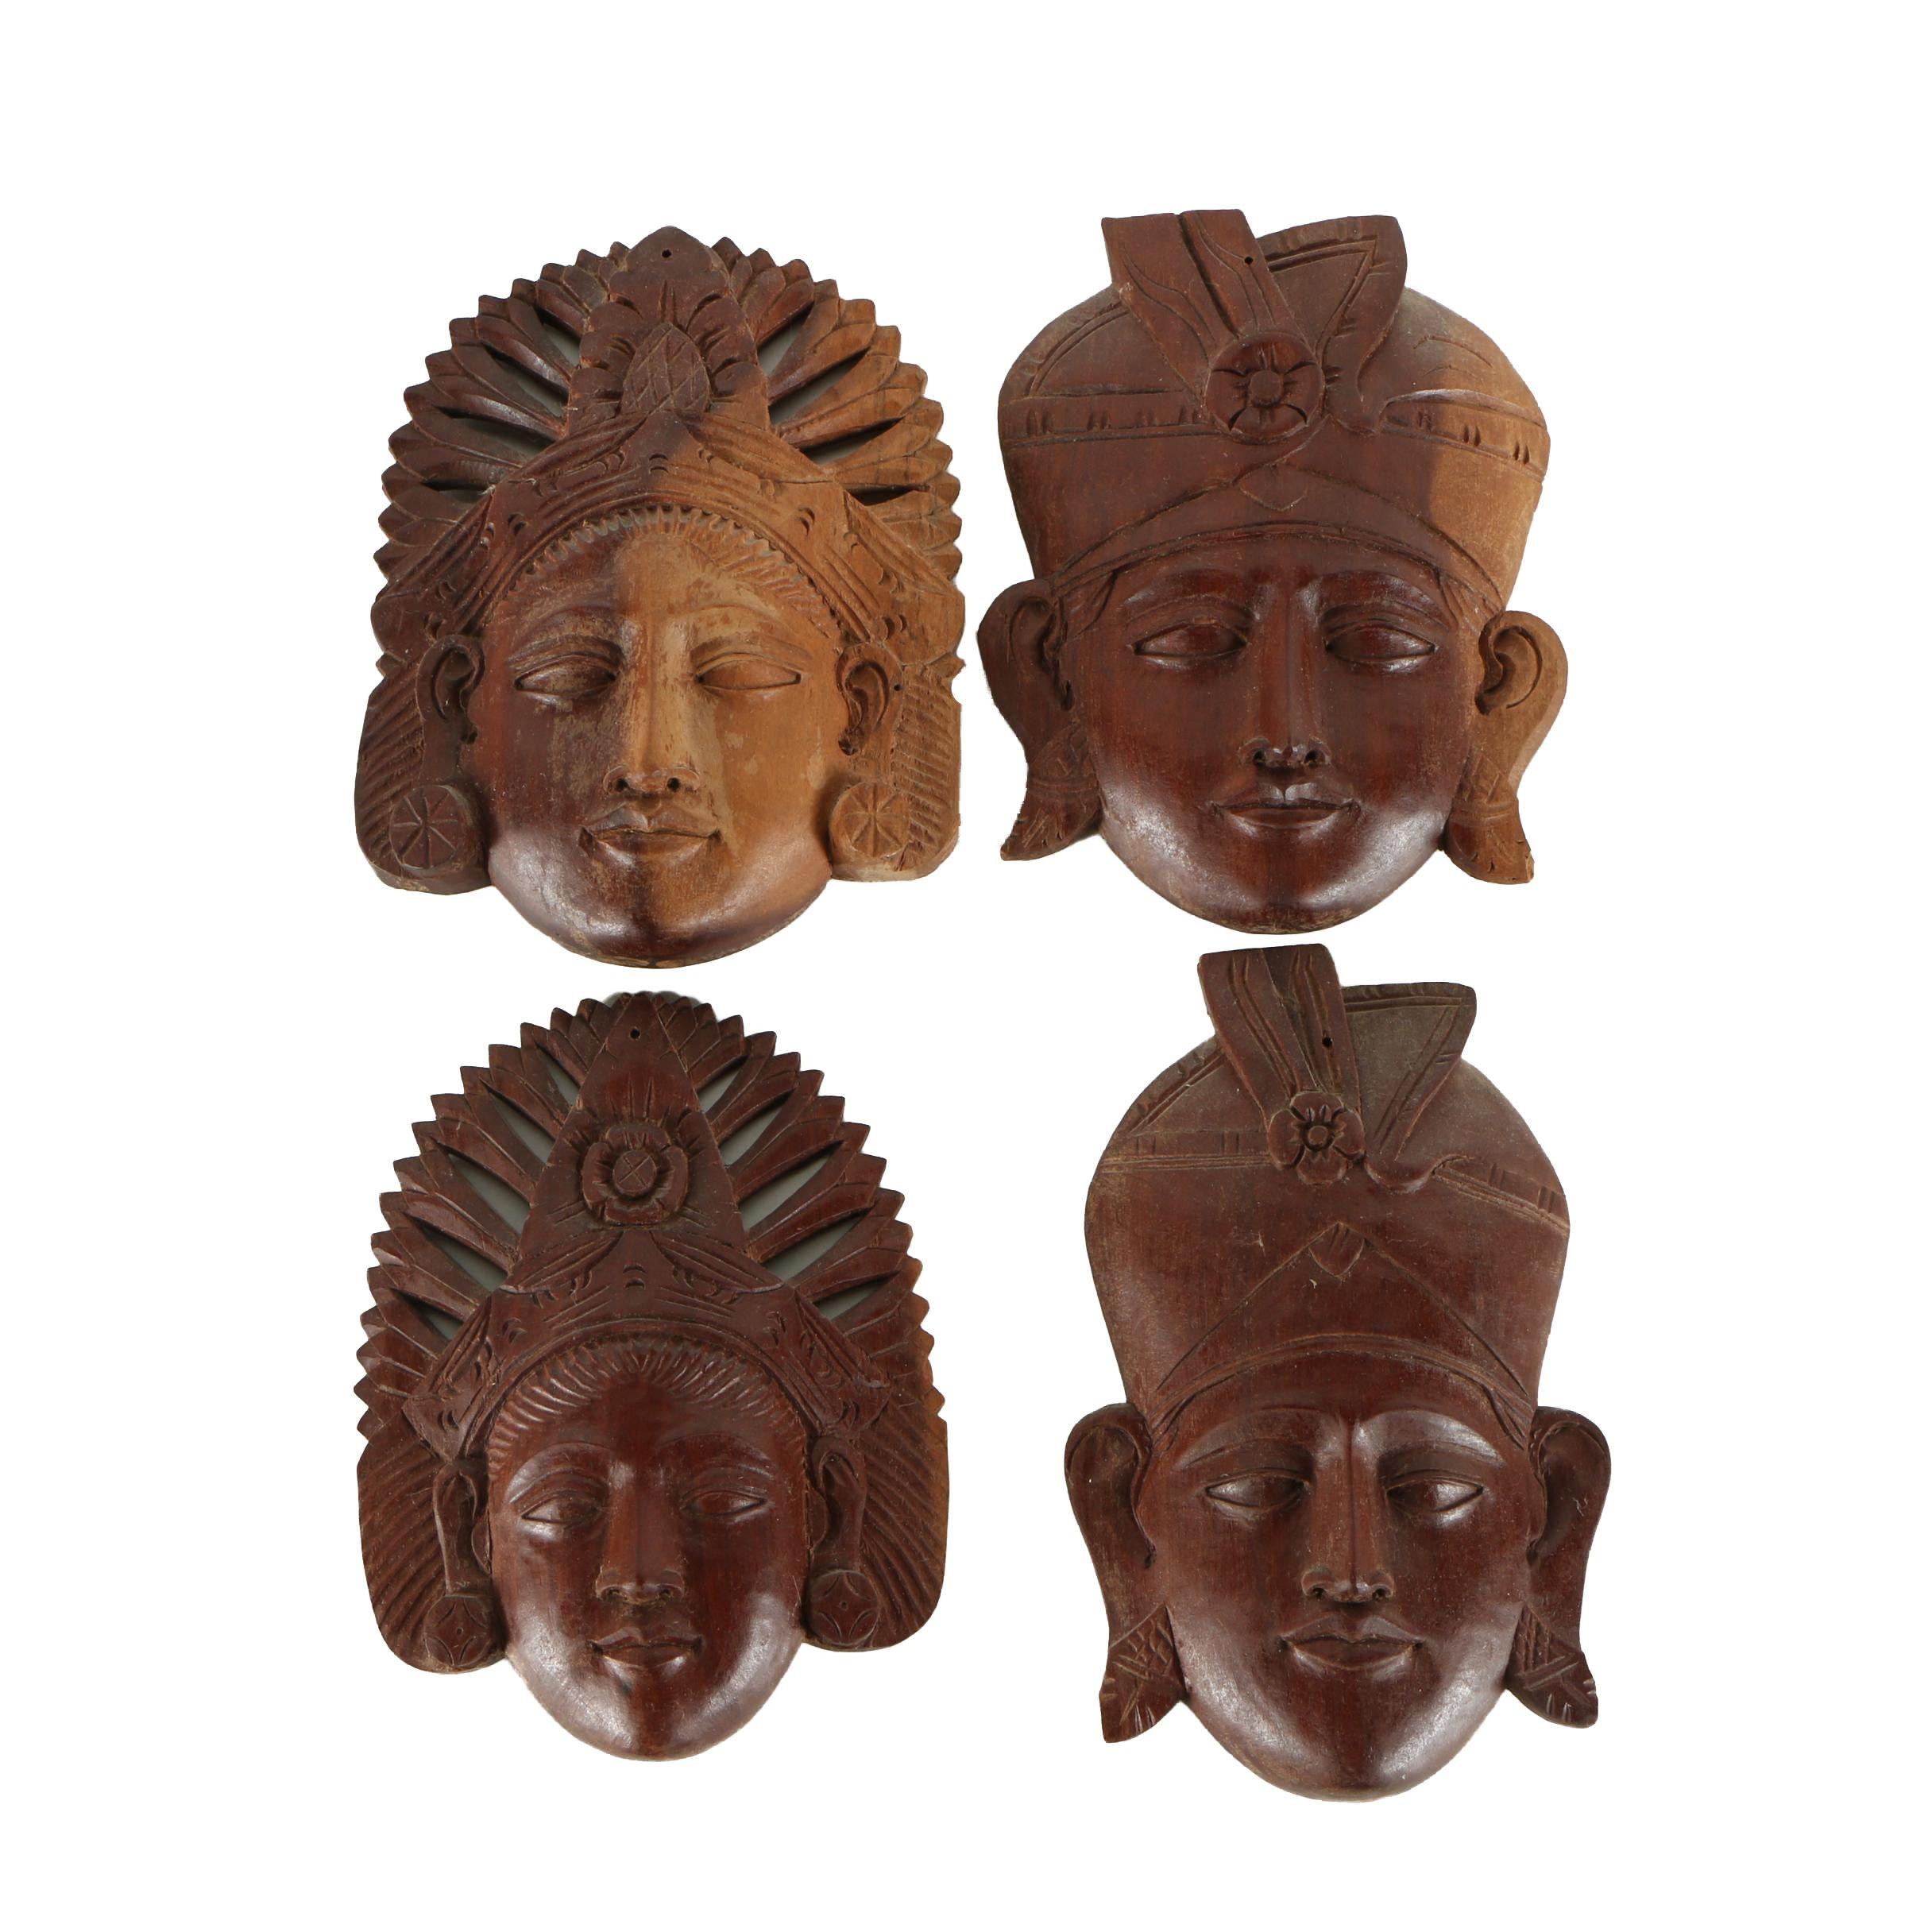 Balinese Carved Wood Wall Masks